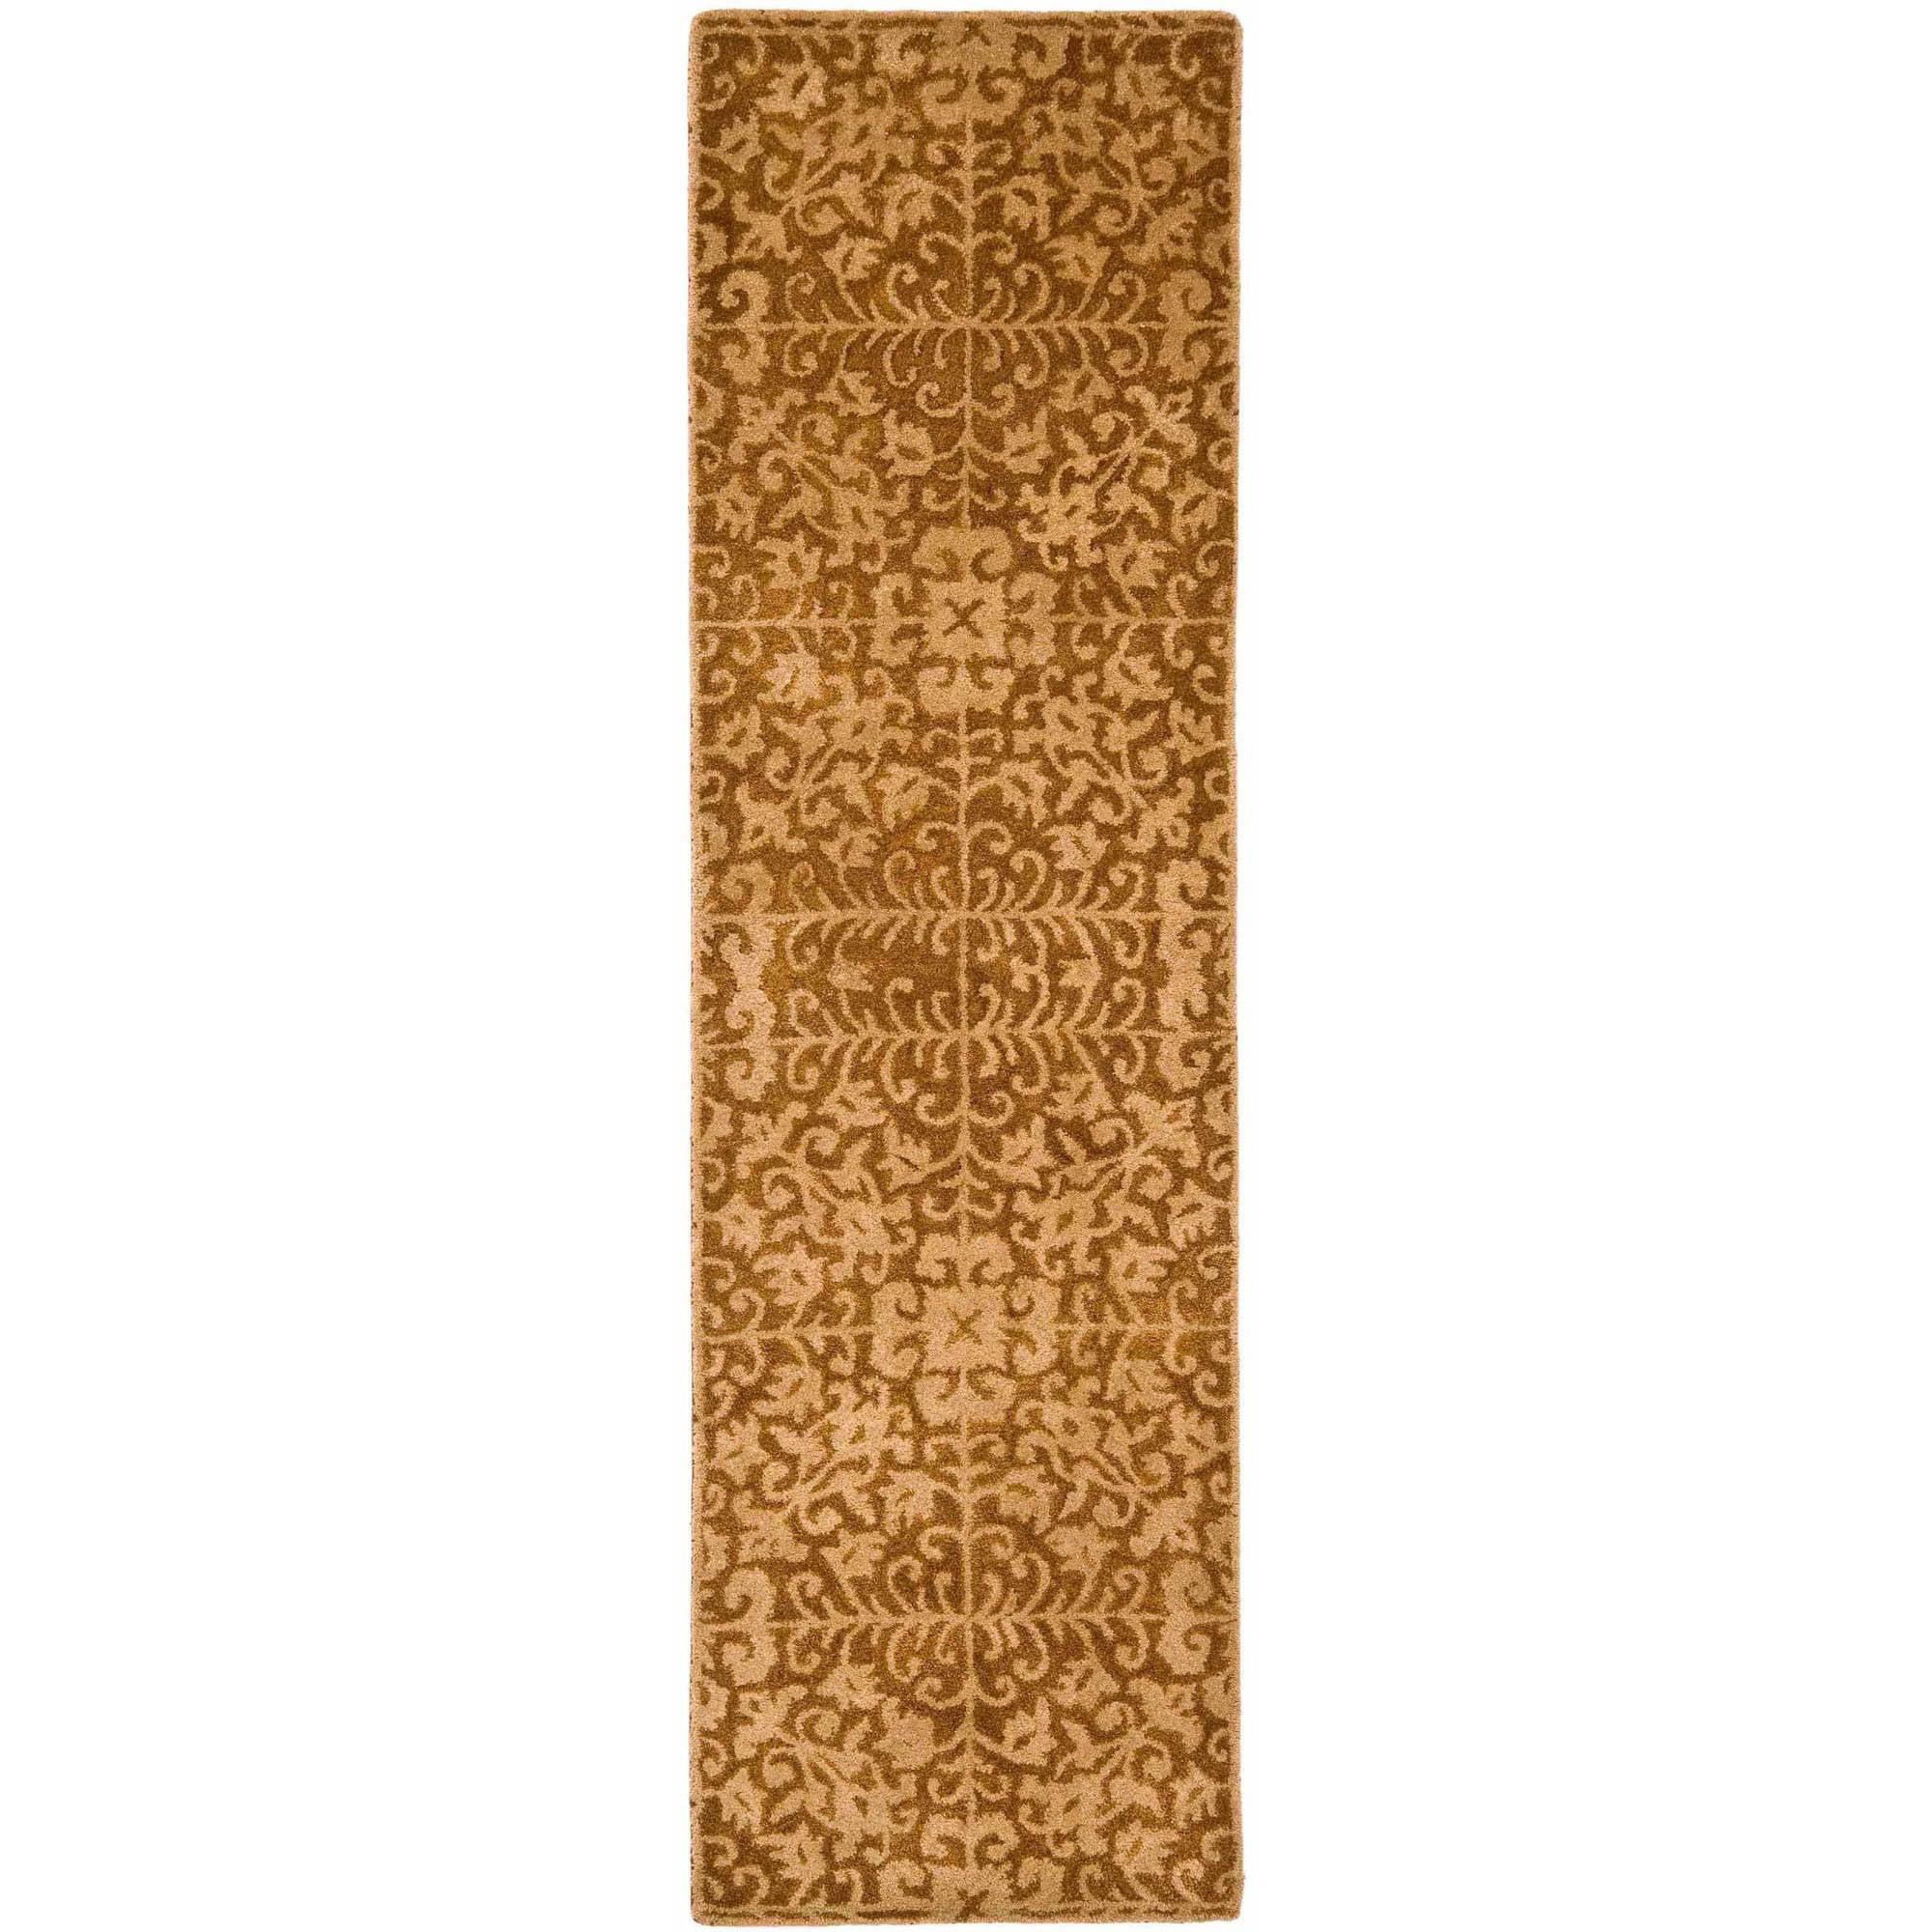 Safavieh Antiquity Richard Hand-Tufted Wool Runner Rug, Gold/Beige